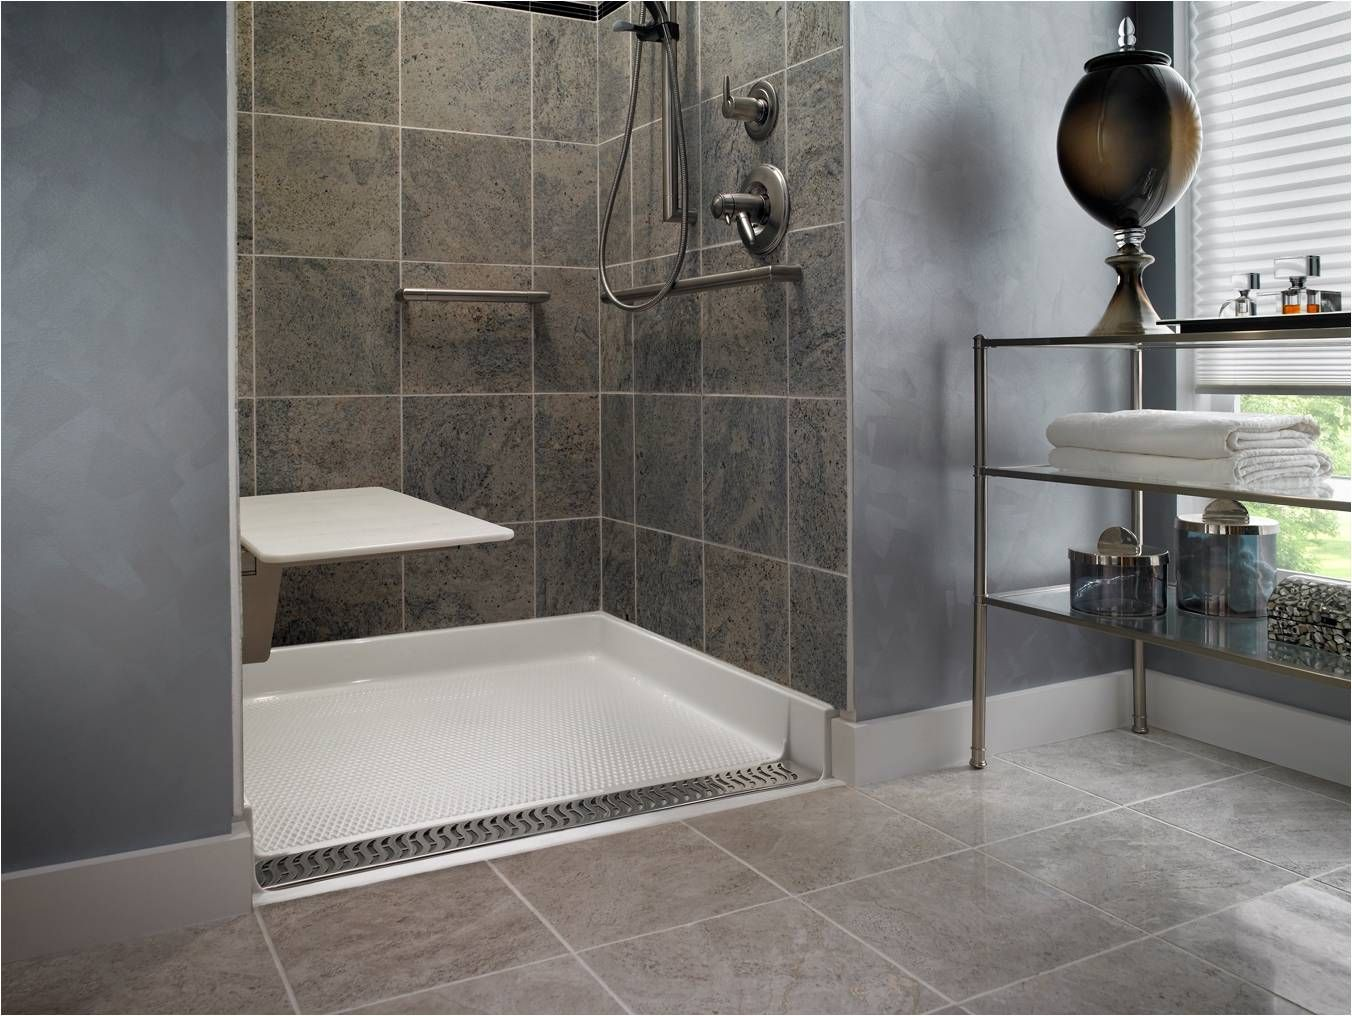 Universal Design Bathroom Best Handicap Bathroom Design For The